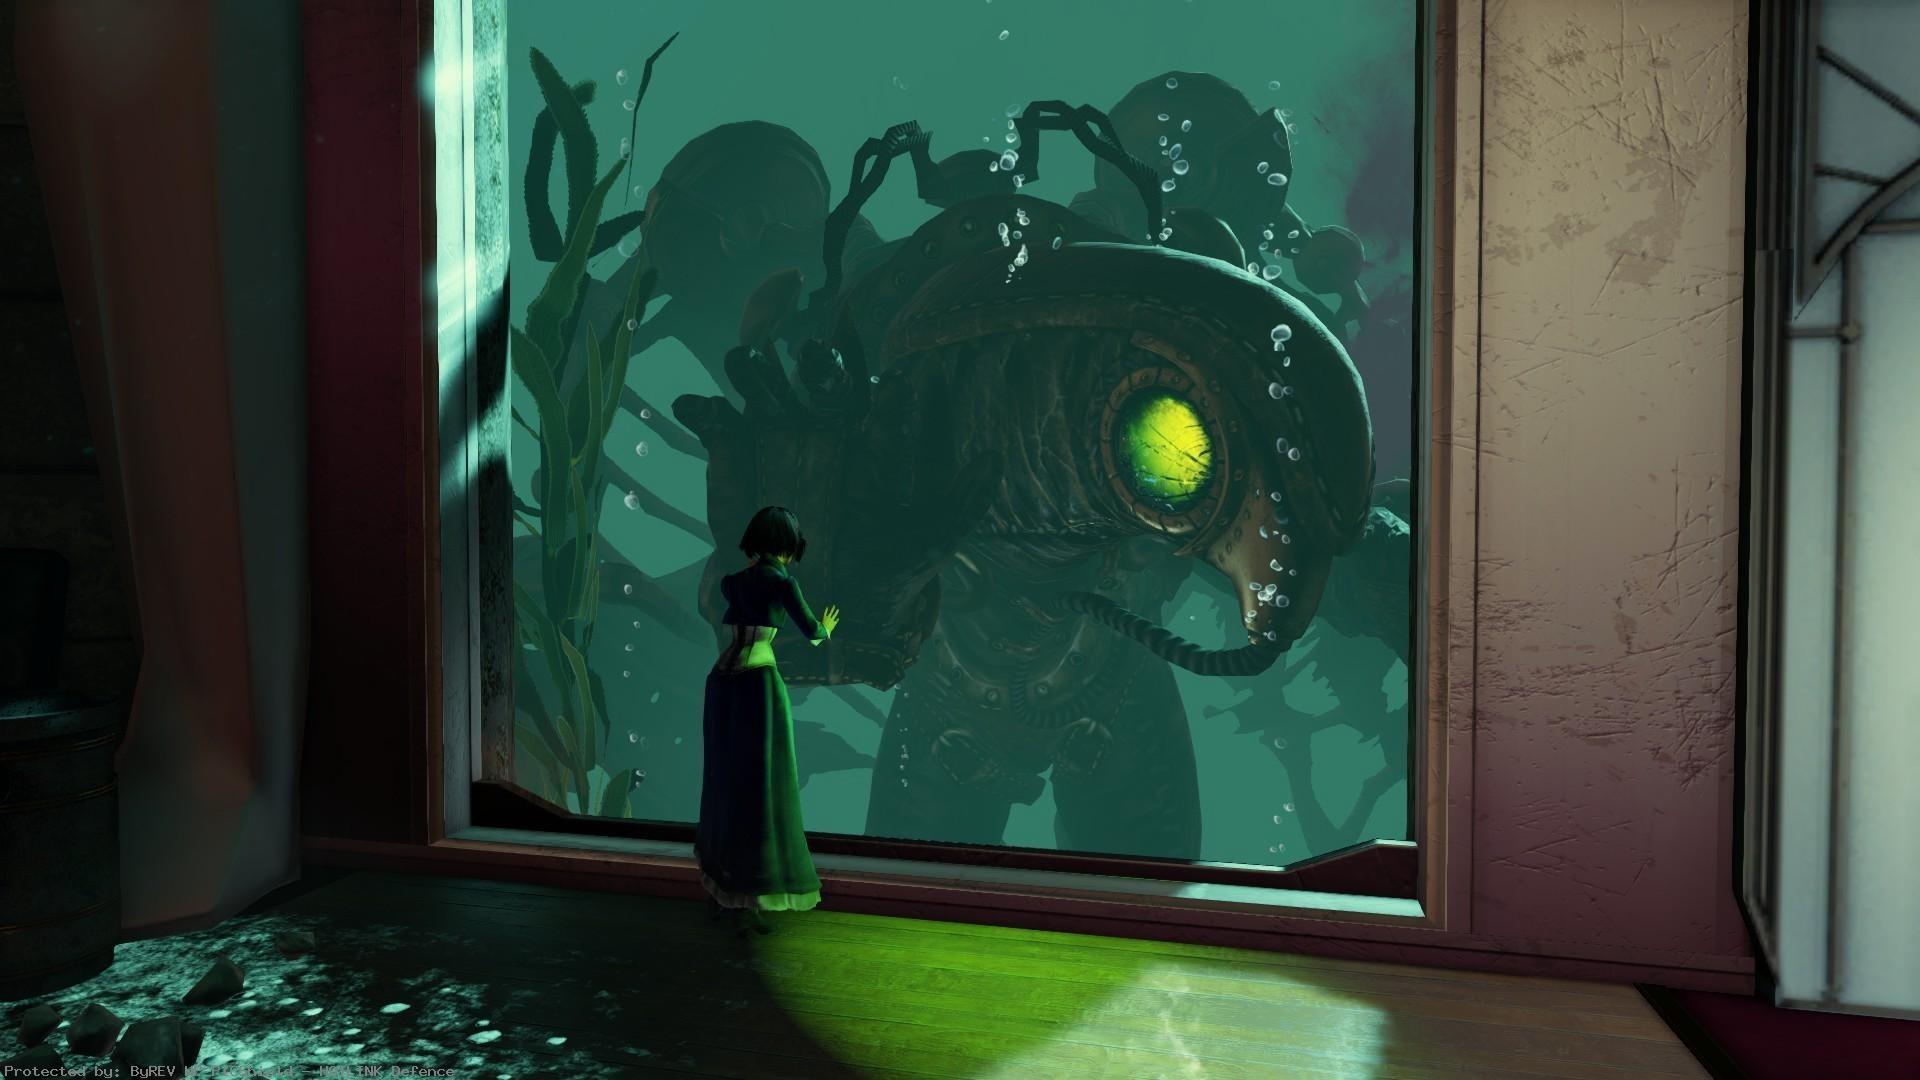 Excellent-Bioshock-Rapture-BioShock-Novel-HD-x-wallpaper-